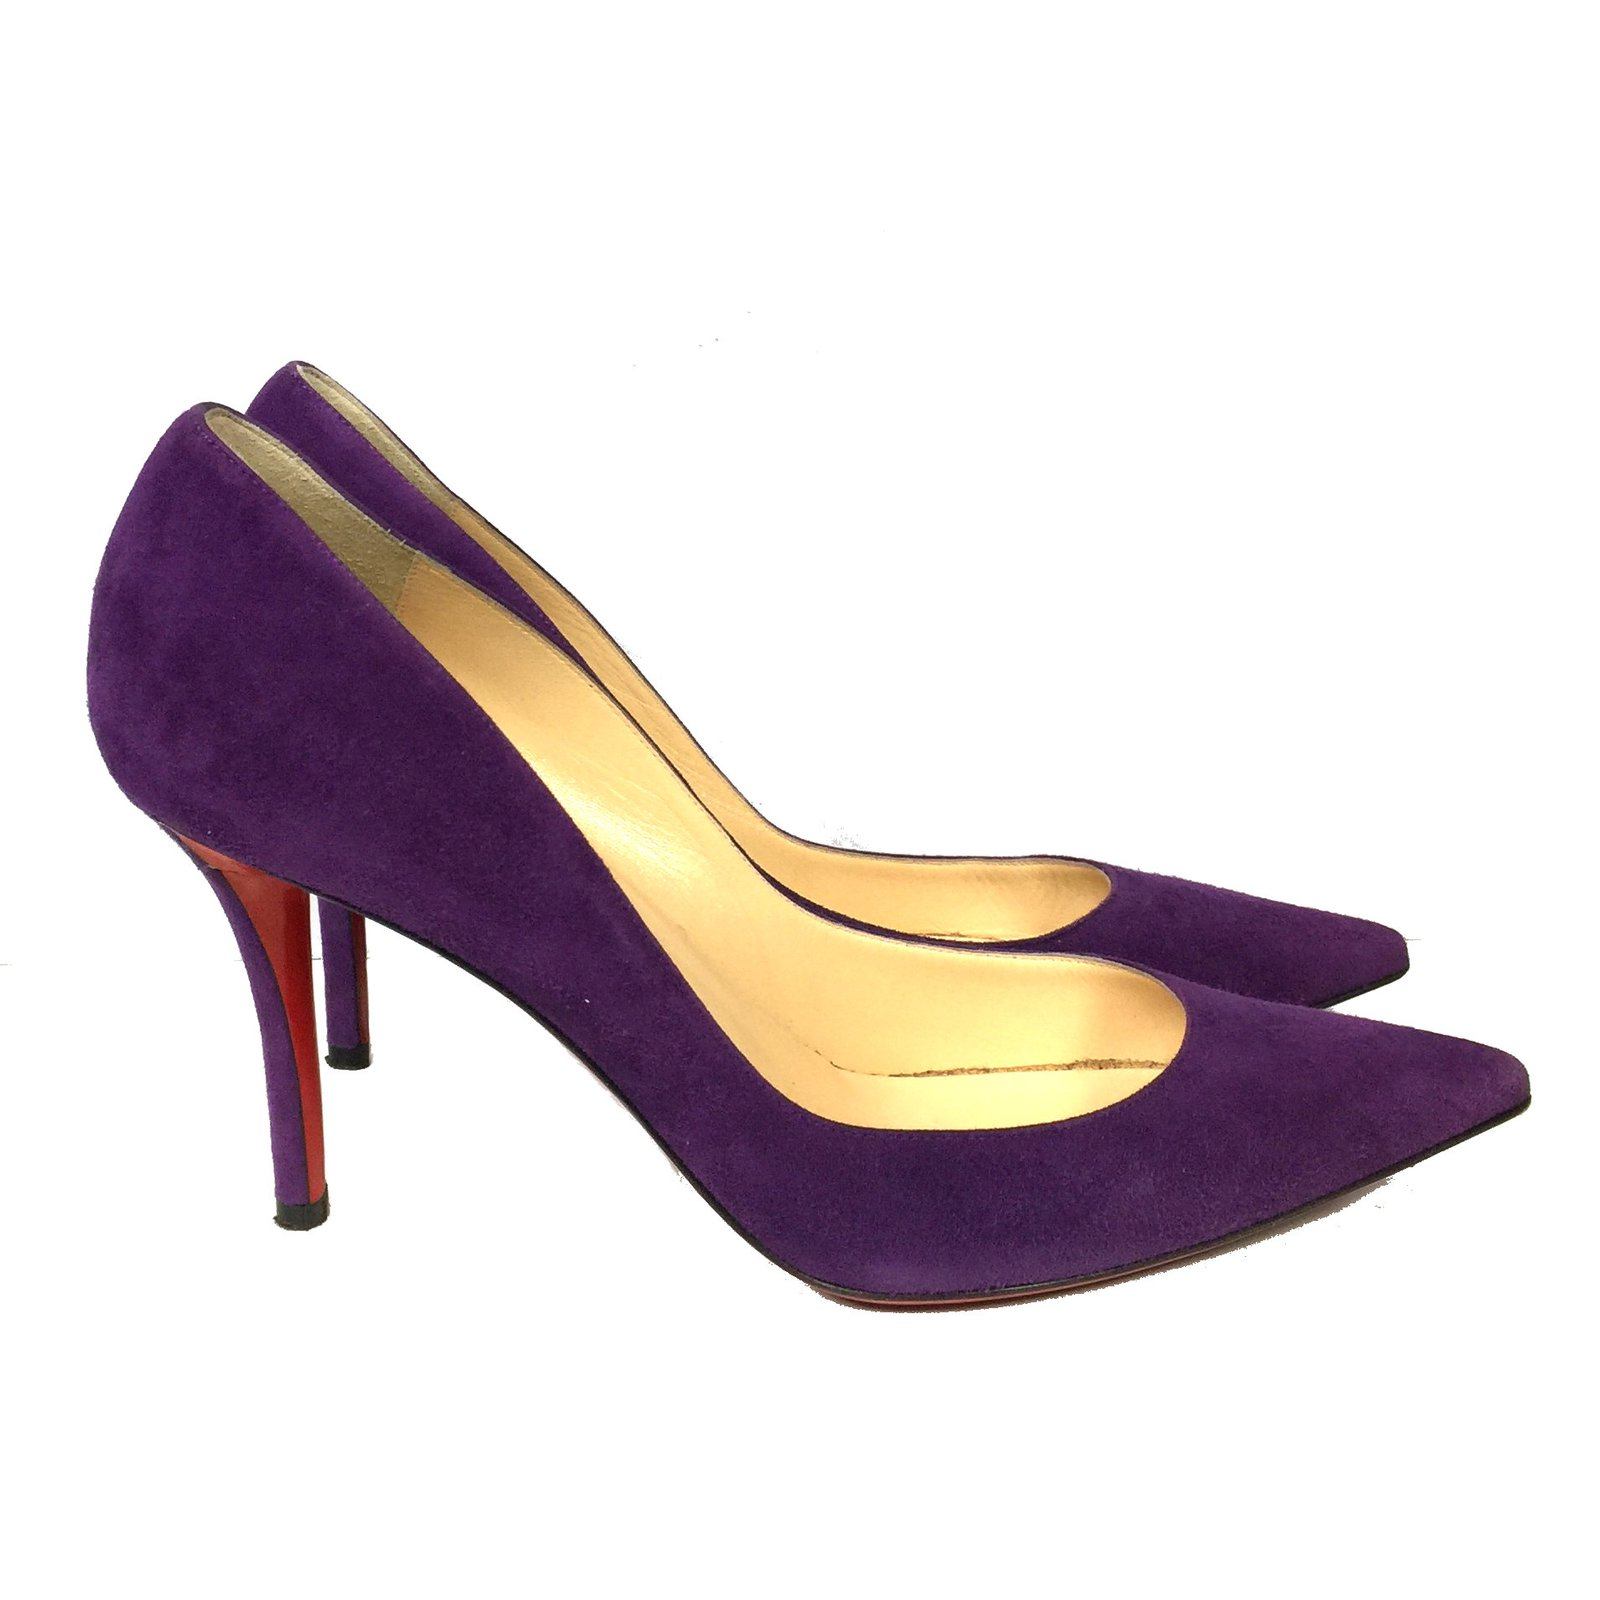 Apostrophy 85 Purple Suede Shoes